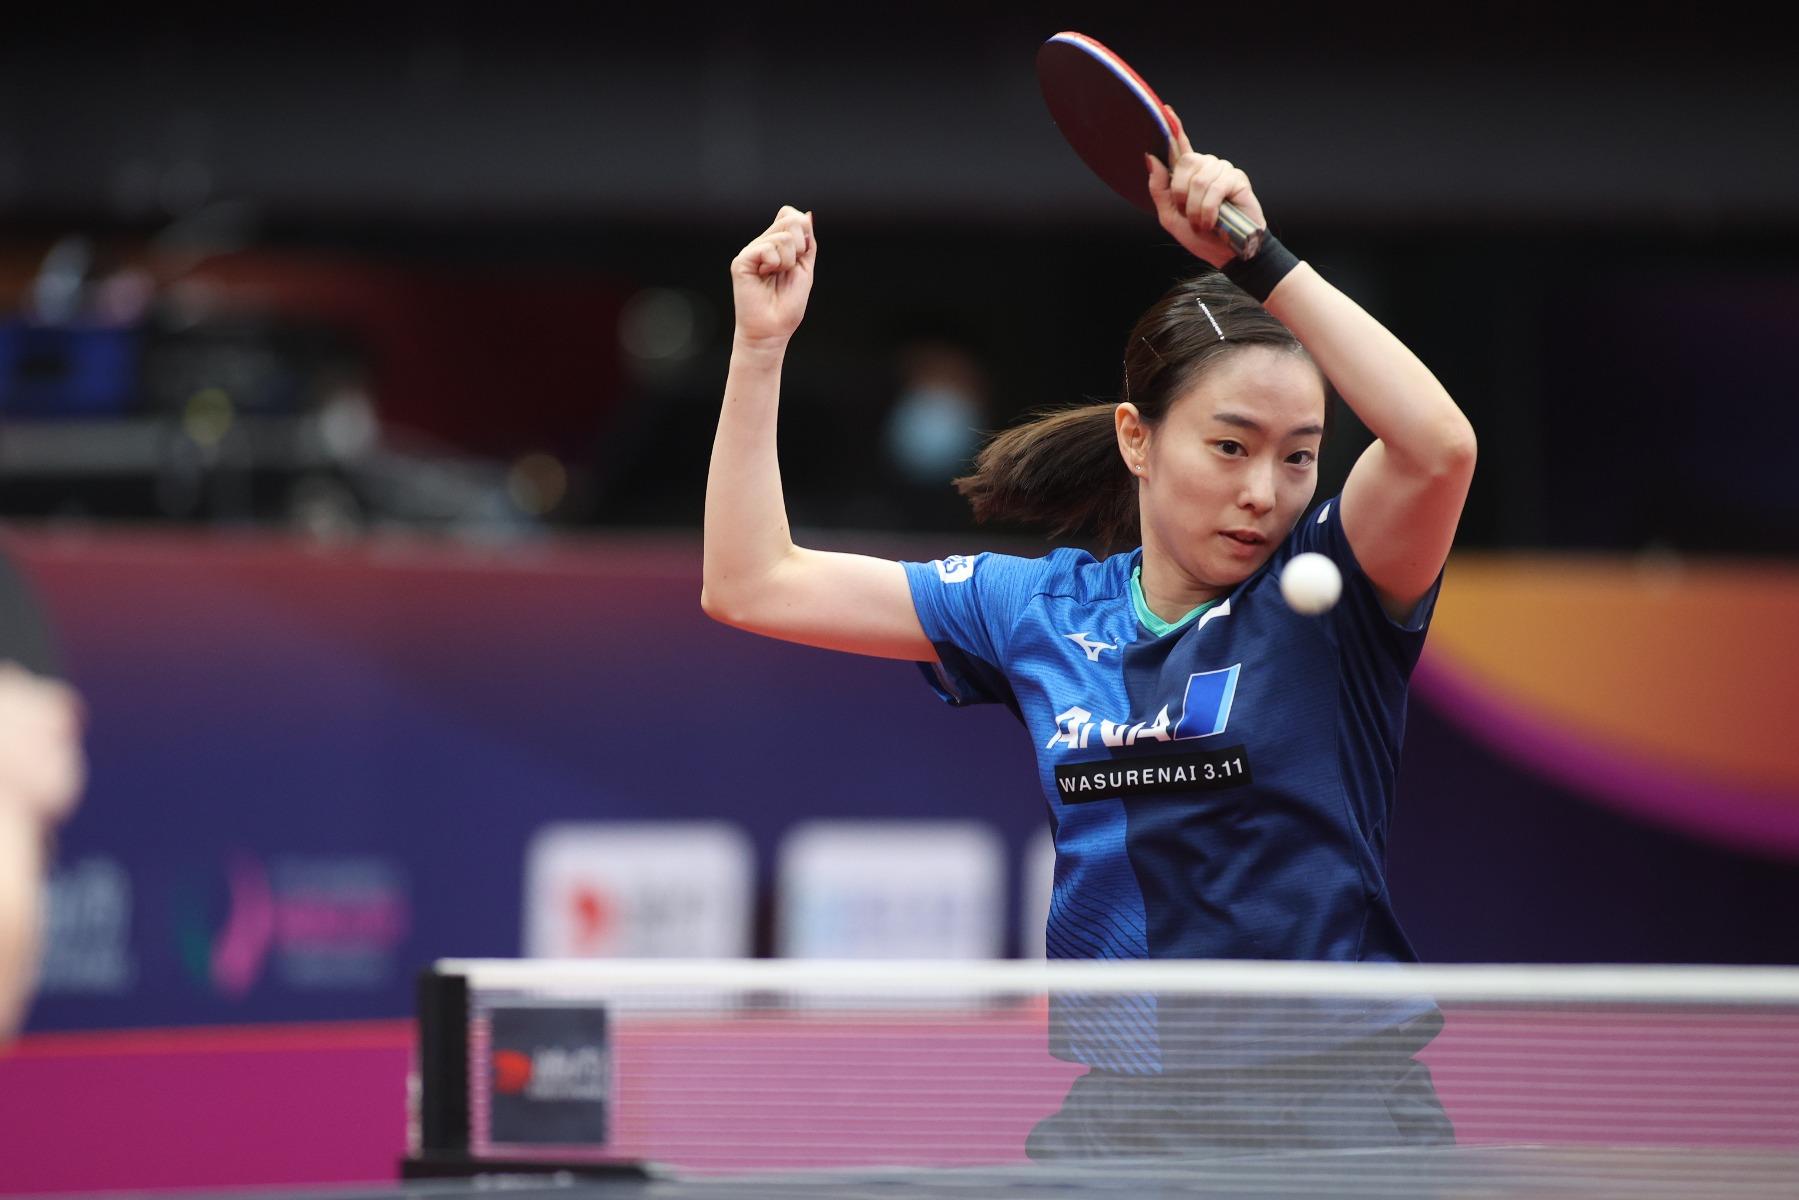 VICTAS VICTAS JOURNAL 卓球 2020女子ワールドカップ 石川佳純